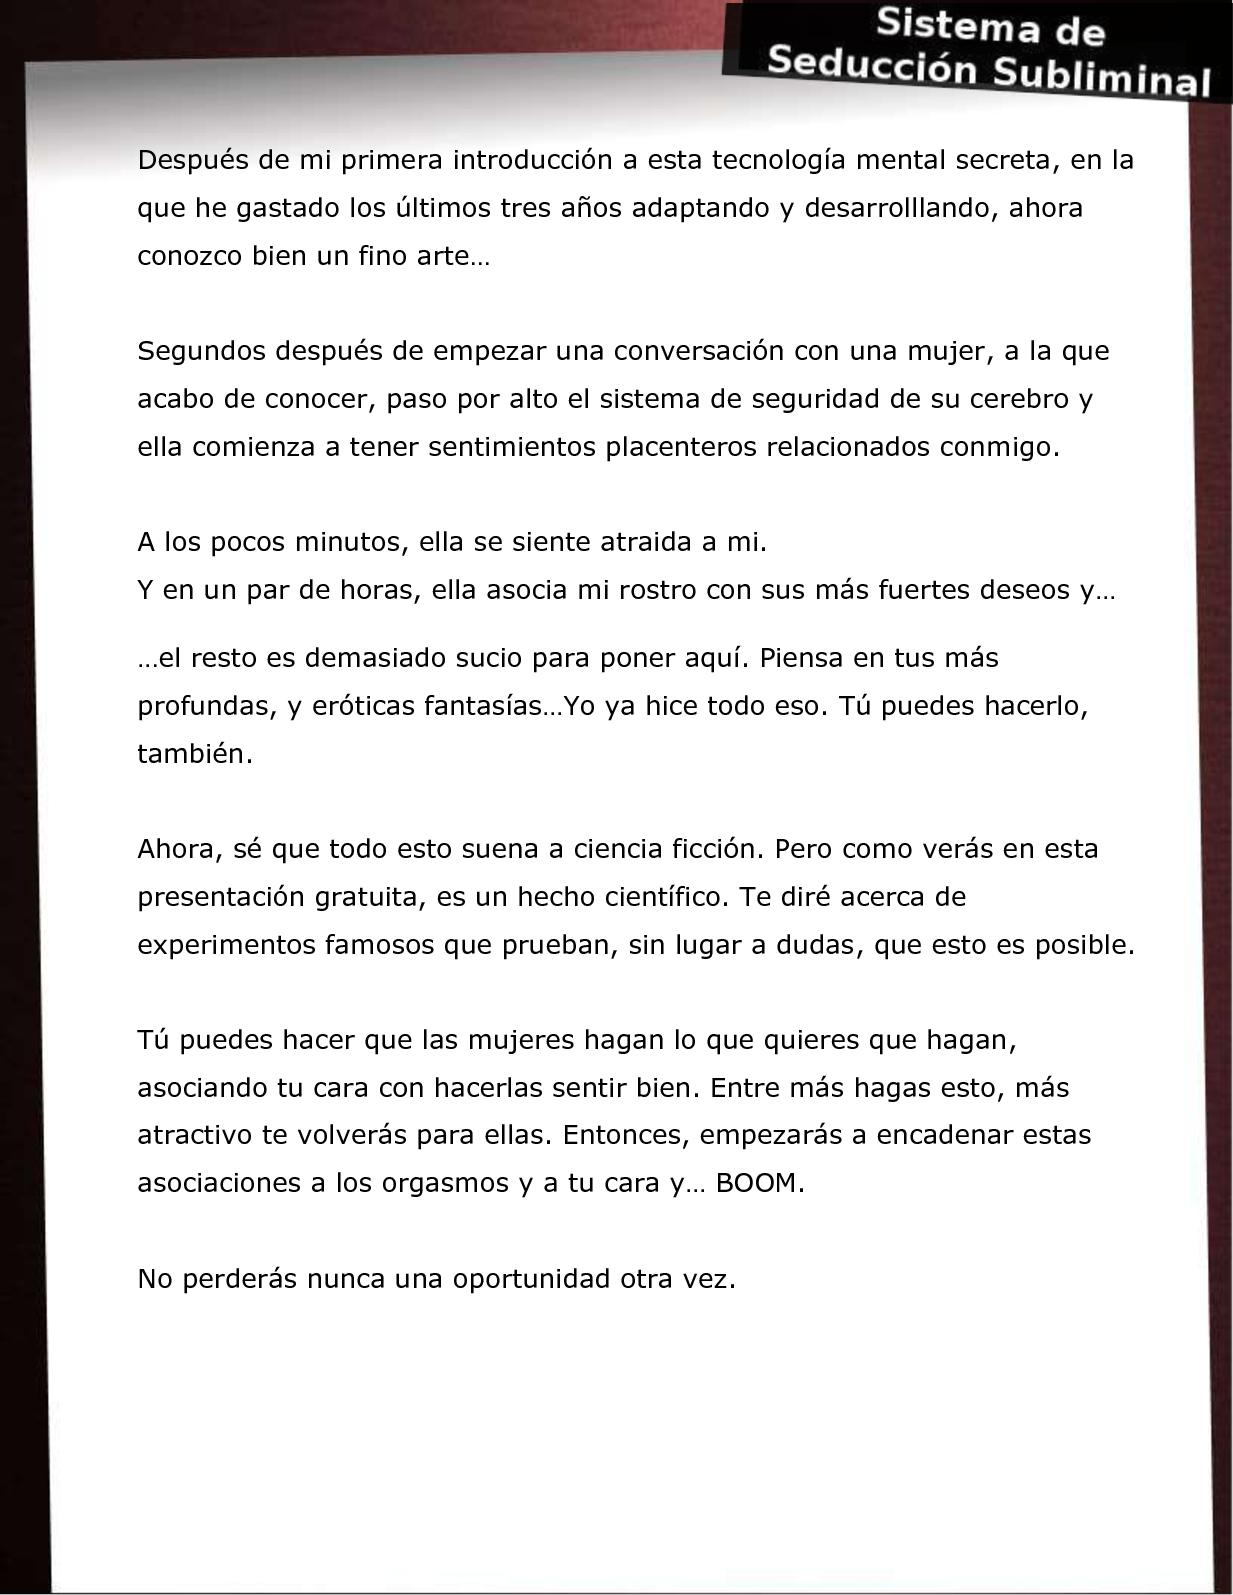 Sistema De Seduccion Subliminal.pdf - 2shared